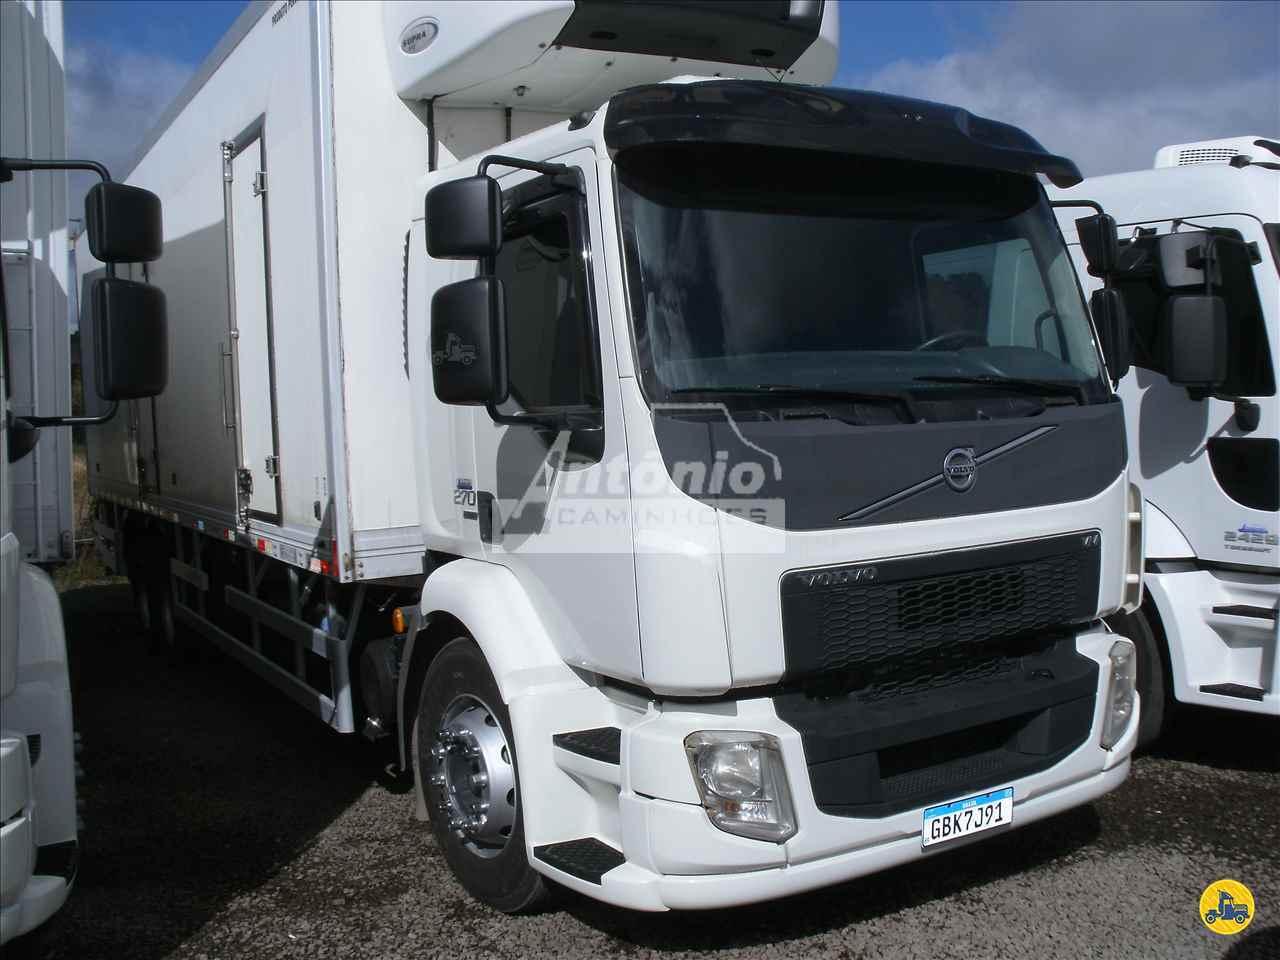 CAMINHAO VOLVO VOLVO VM 270 Baú Frigorífico Truck 6x2 Antônio Caminhões GARIBALDI RIO GRANDE DO SUL RS